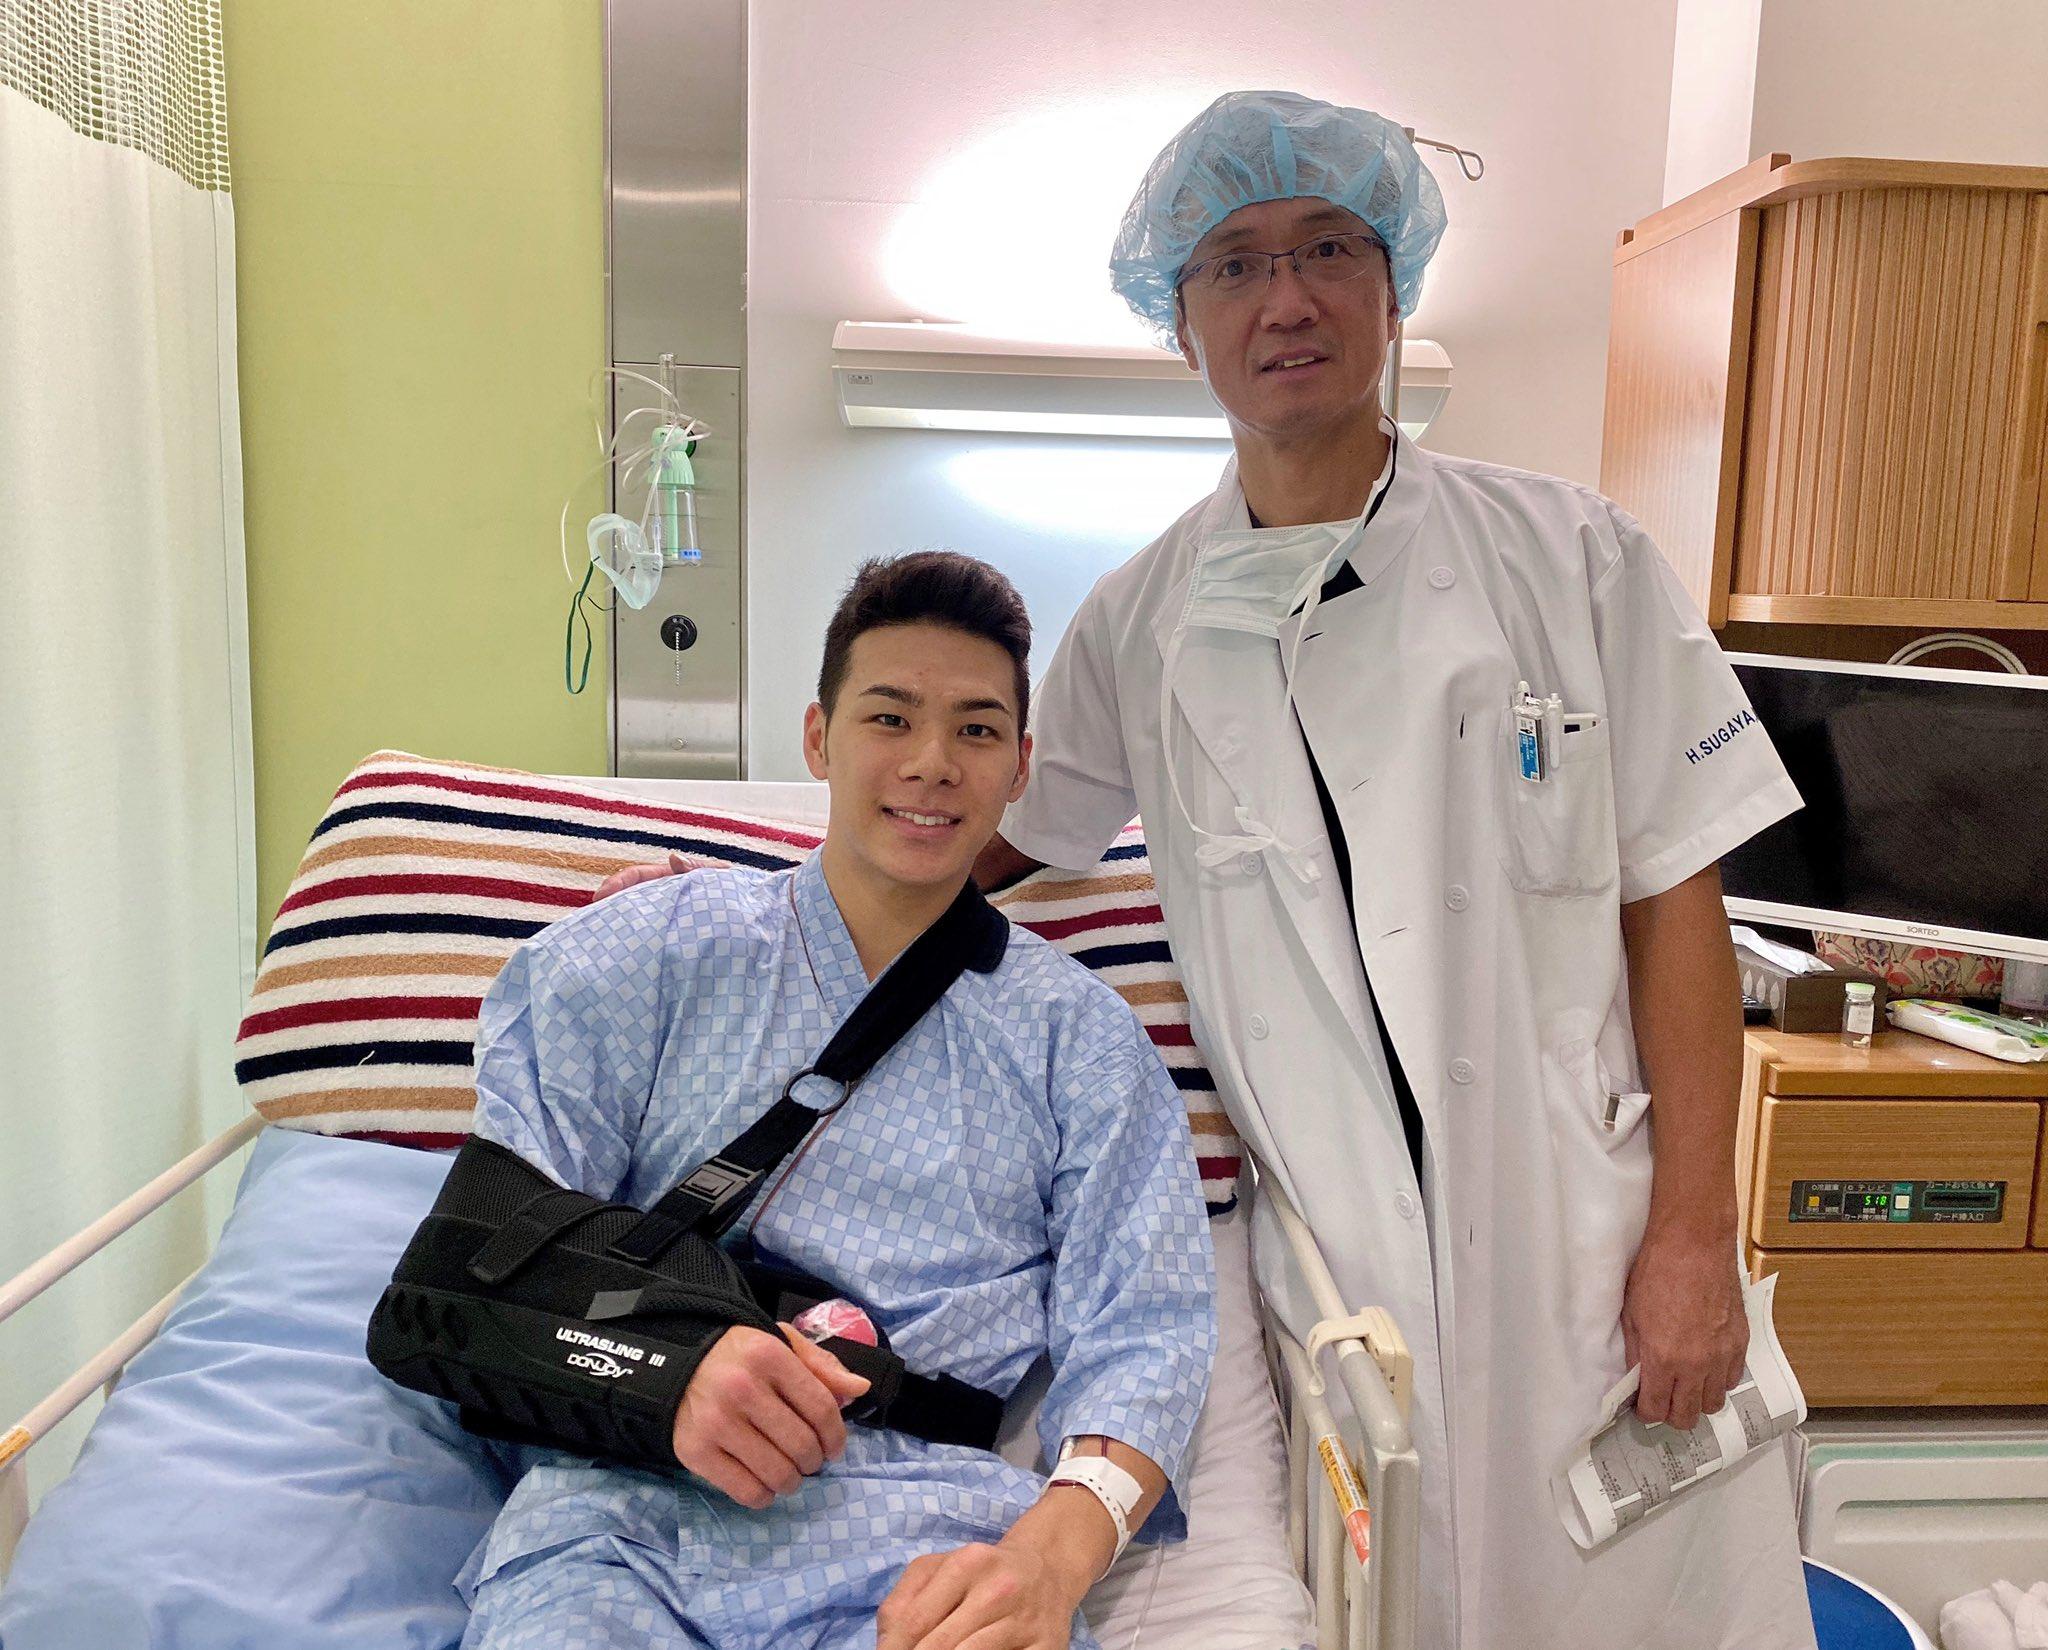 MotoGP2019 中上 アッセンで痛めた肩の手術を完了